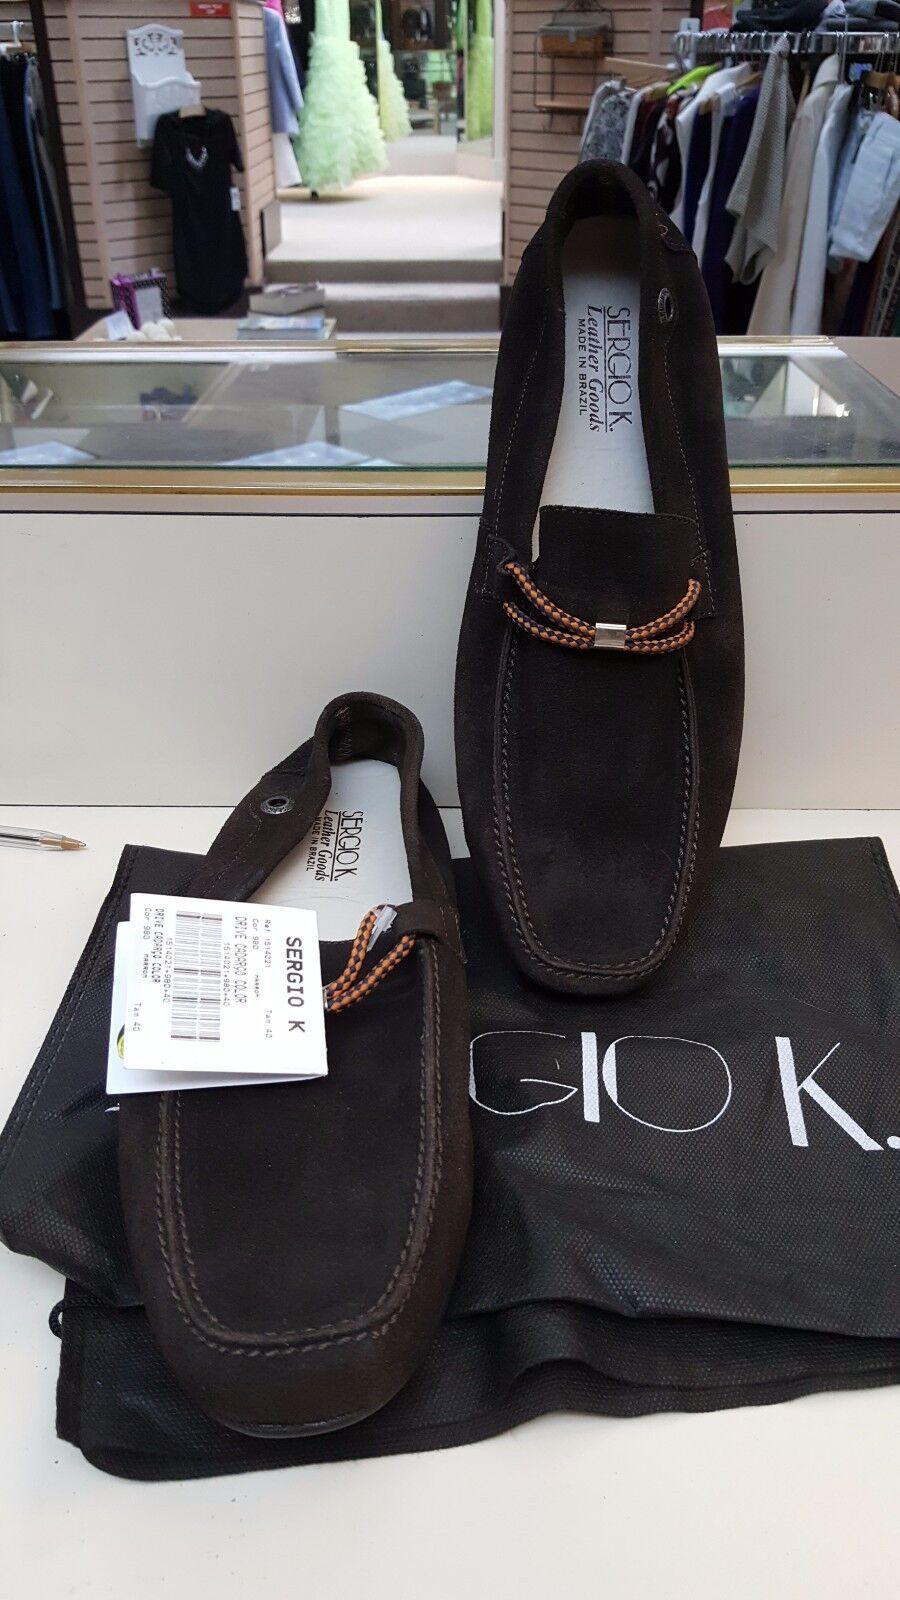 New Uomo Sergio K Loafers size 7